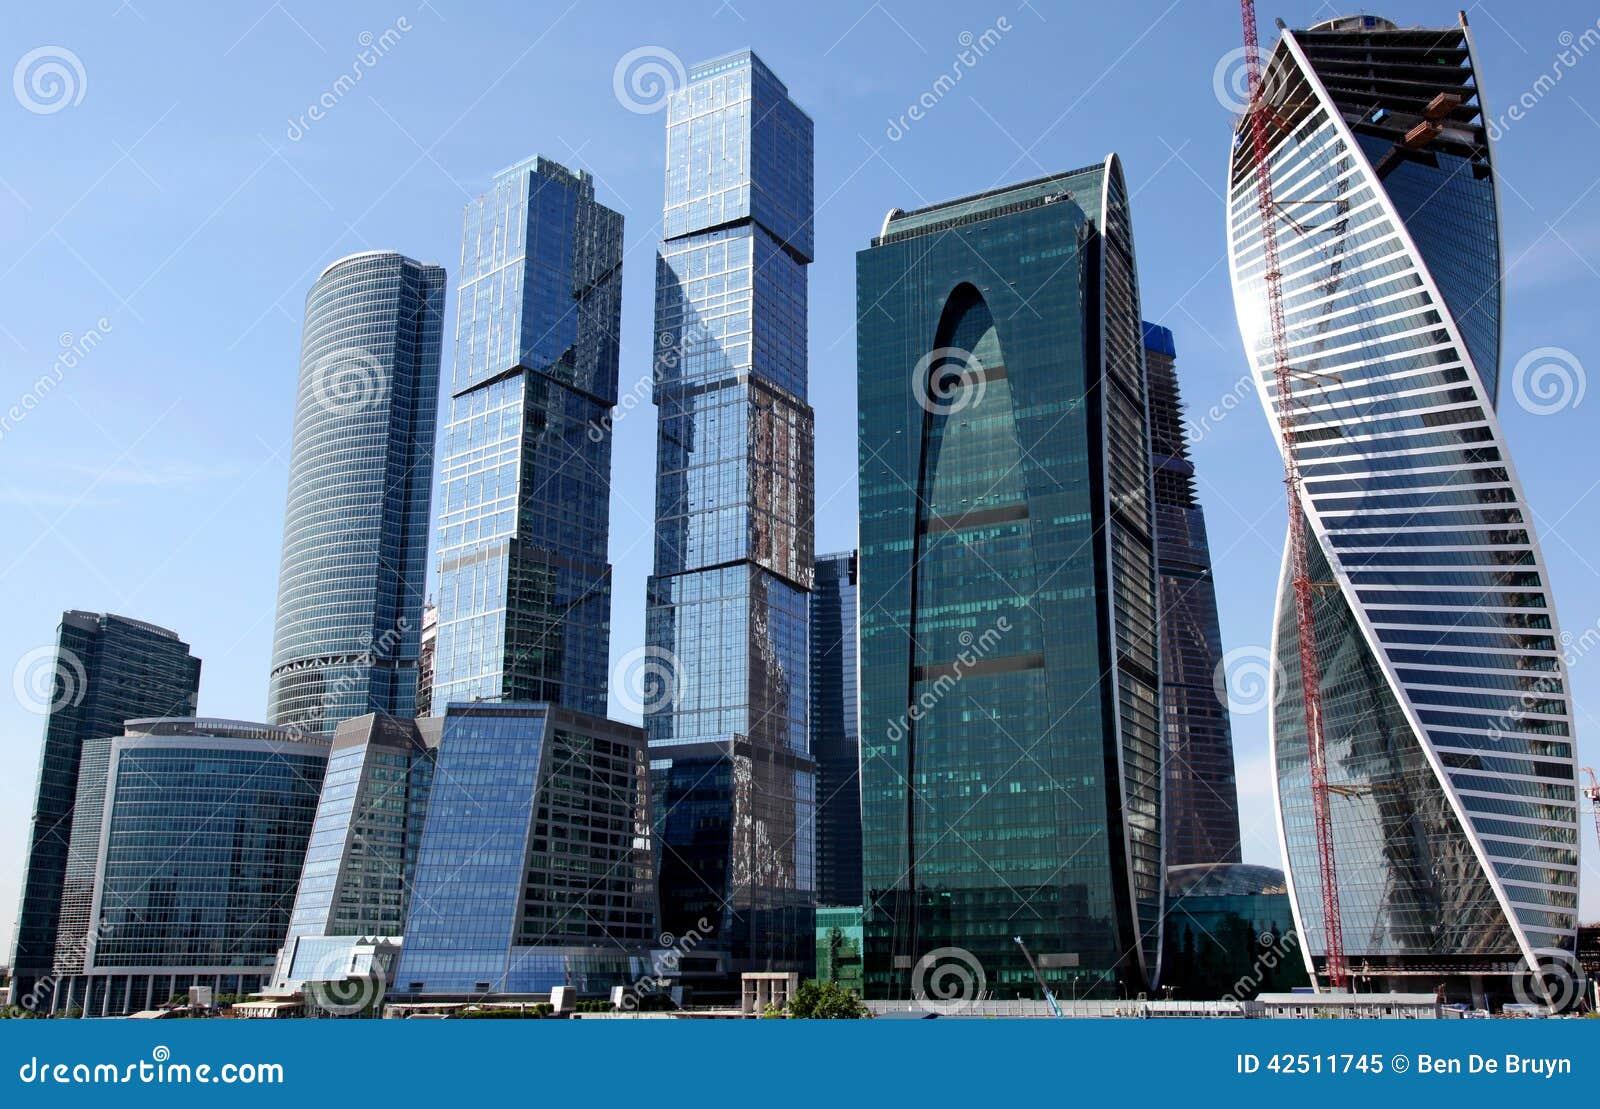 Dreams Of Tall Buildings - Dreams Of Tall Buildings